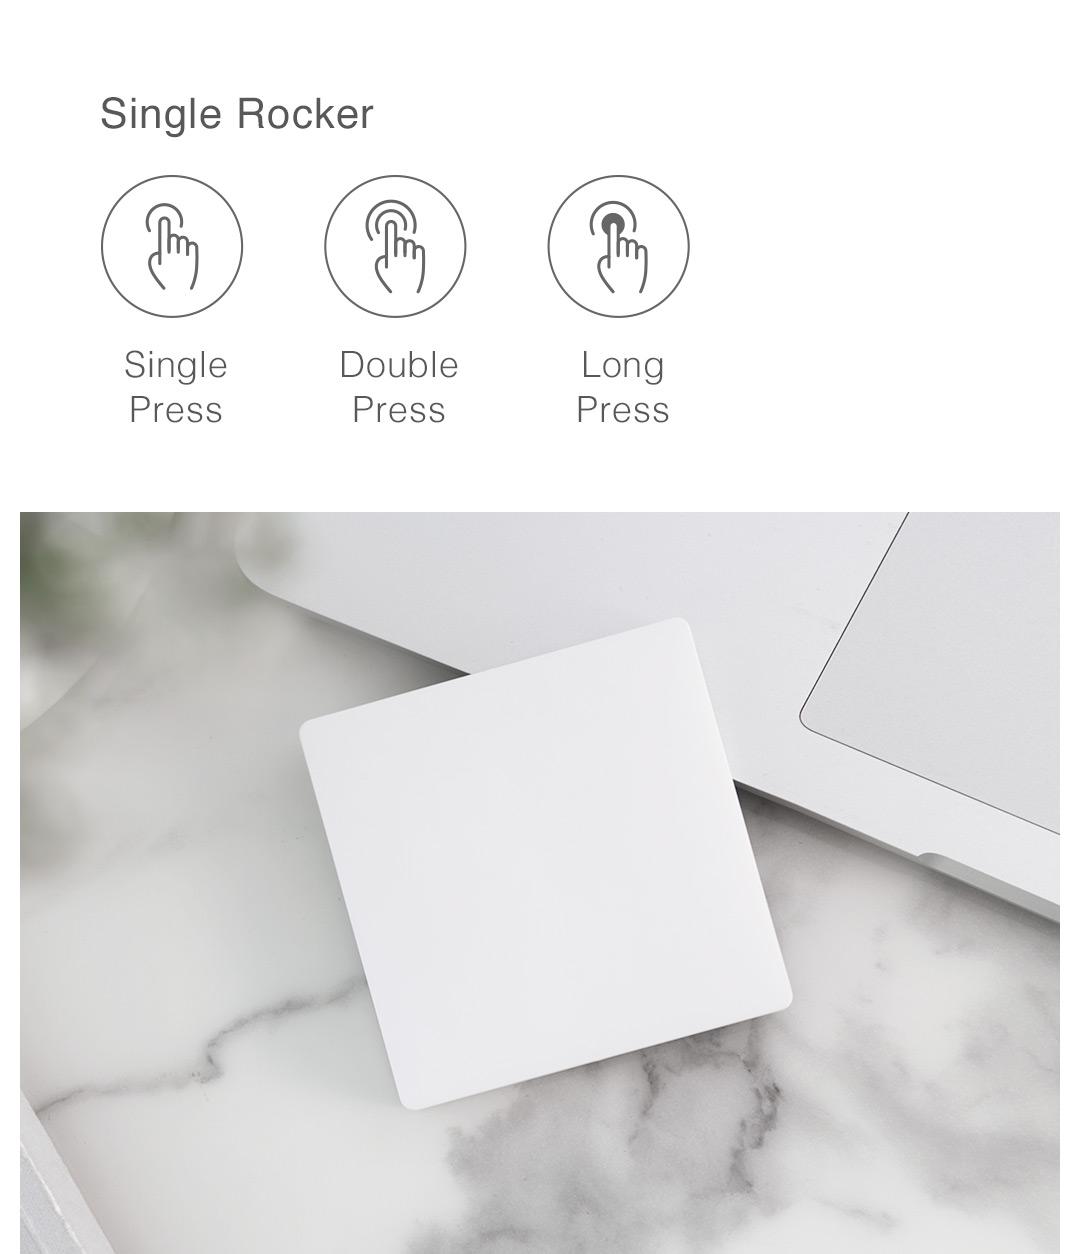 Aqara wireless remote switch single rocker function: single press, double press, long press